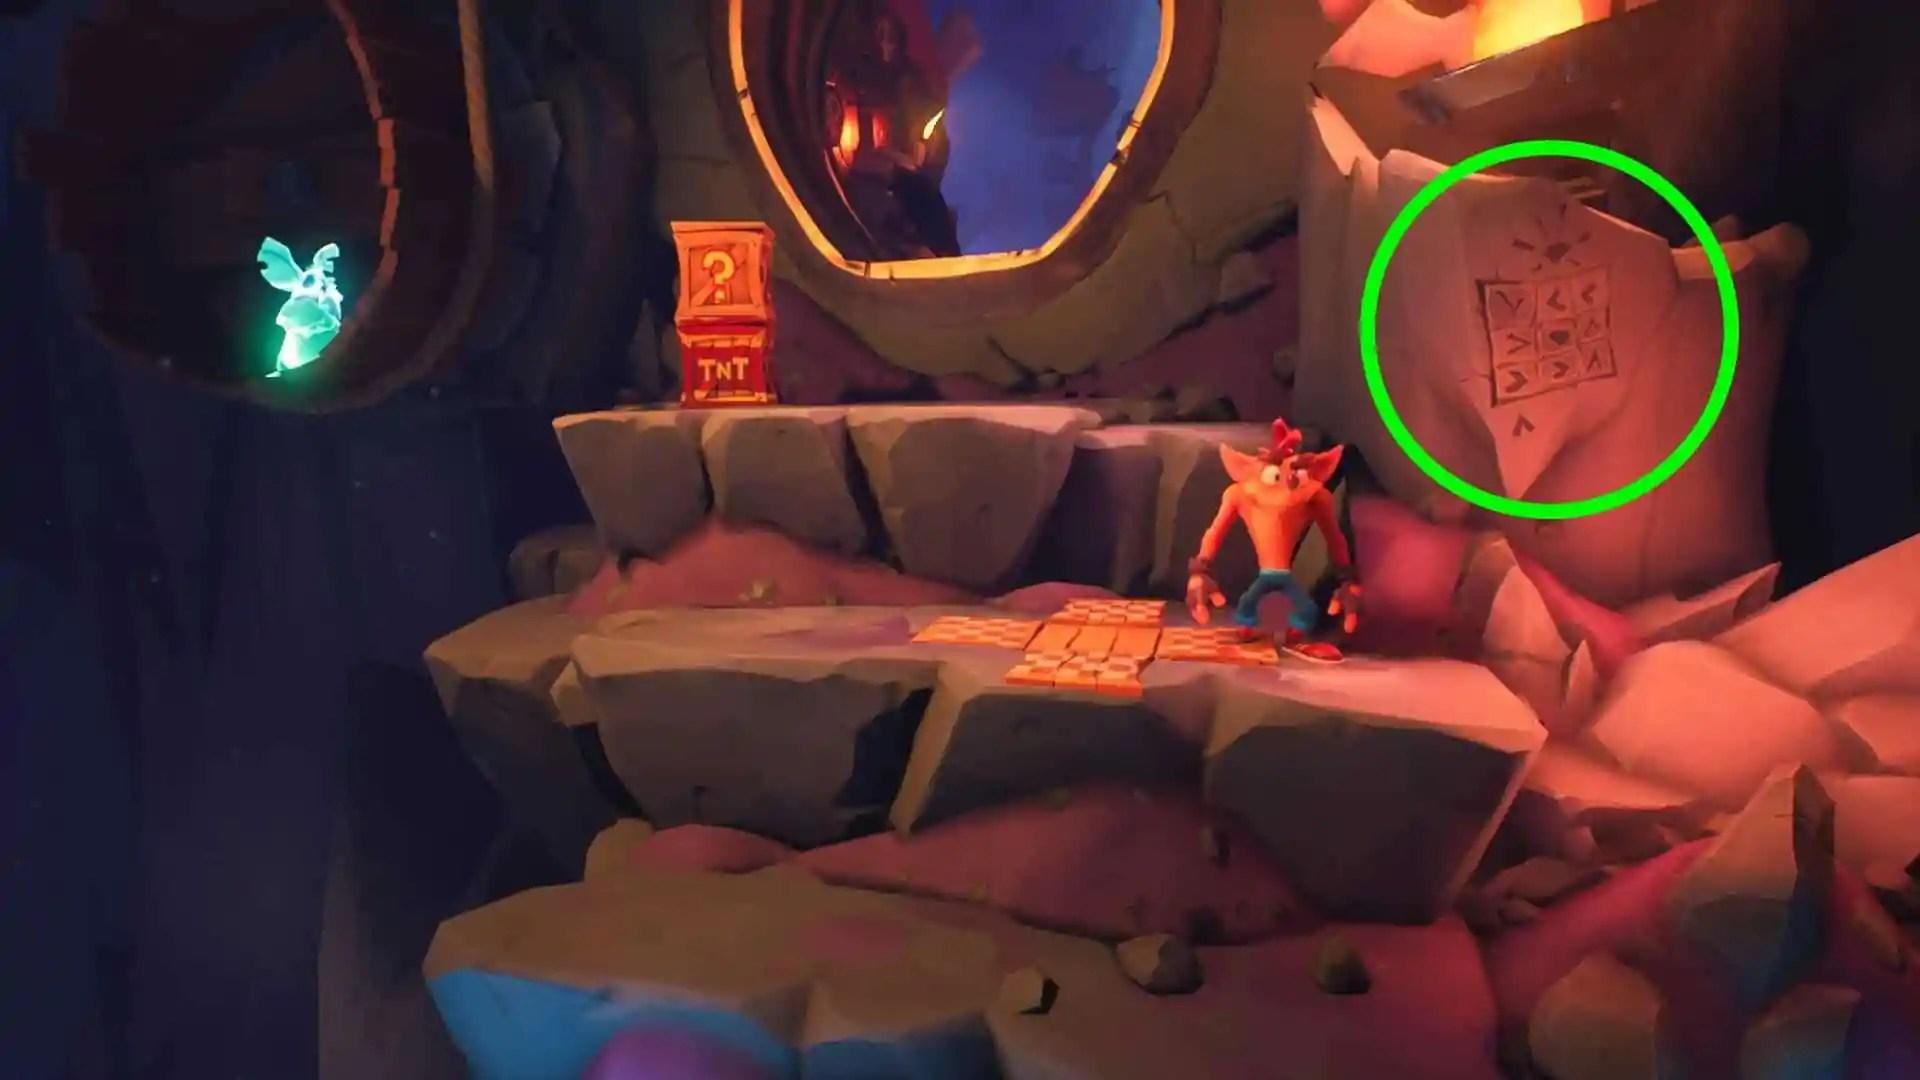 Crash-Bandicoot 4